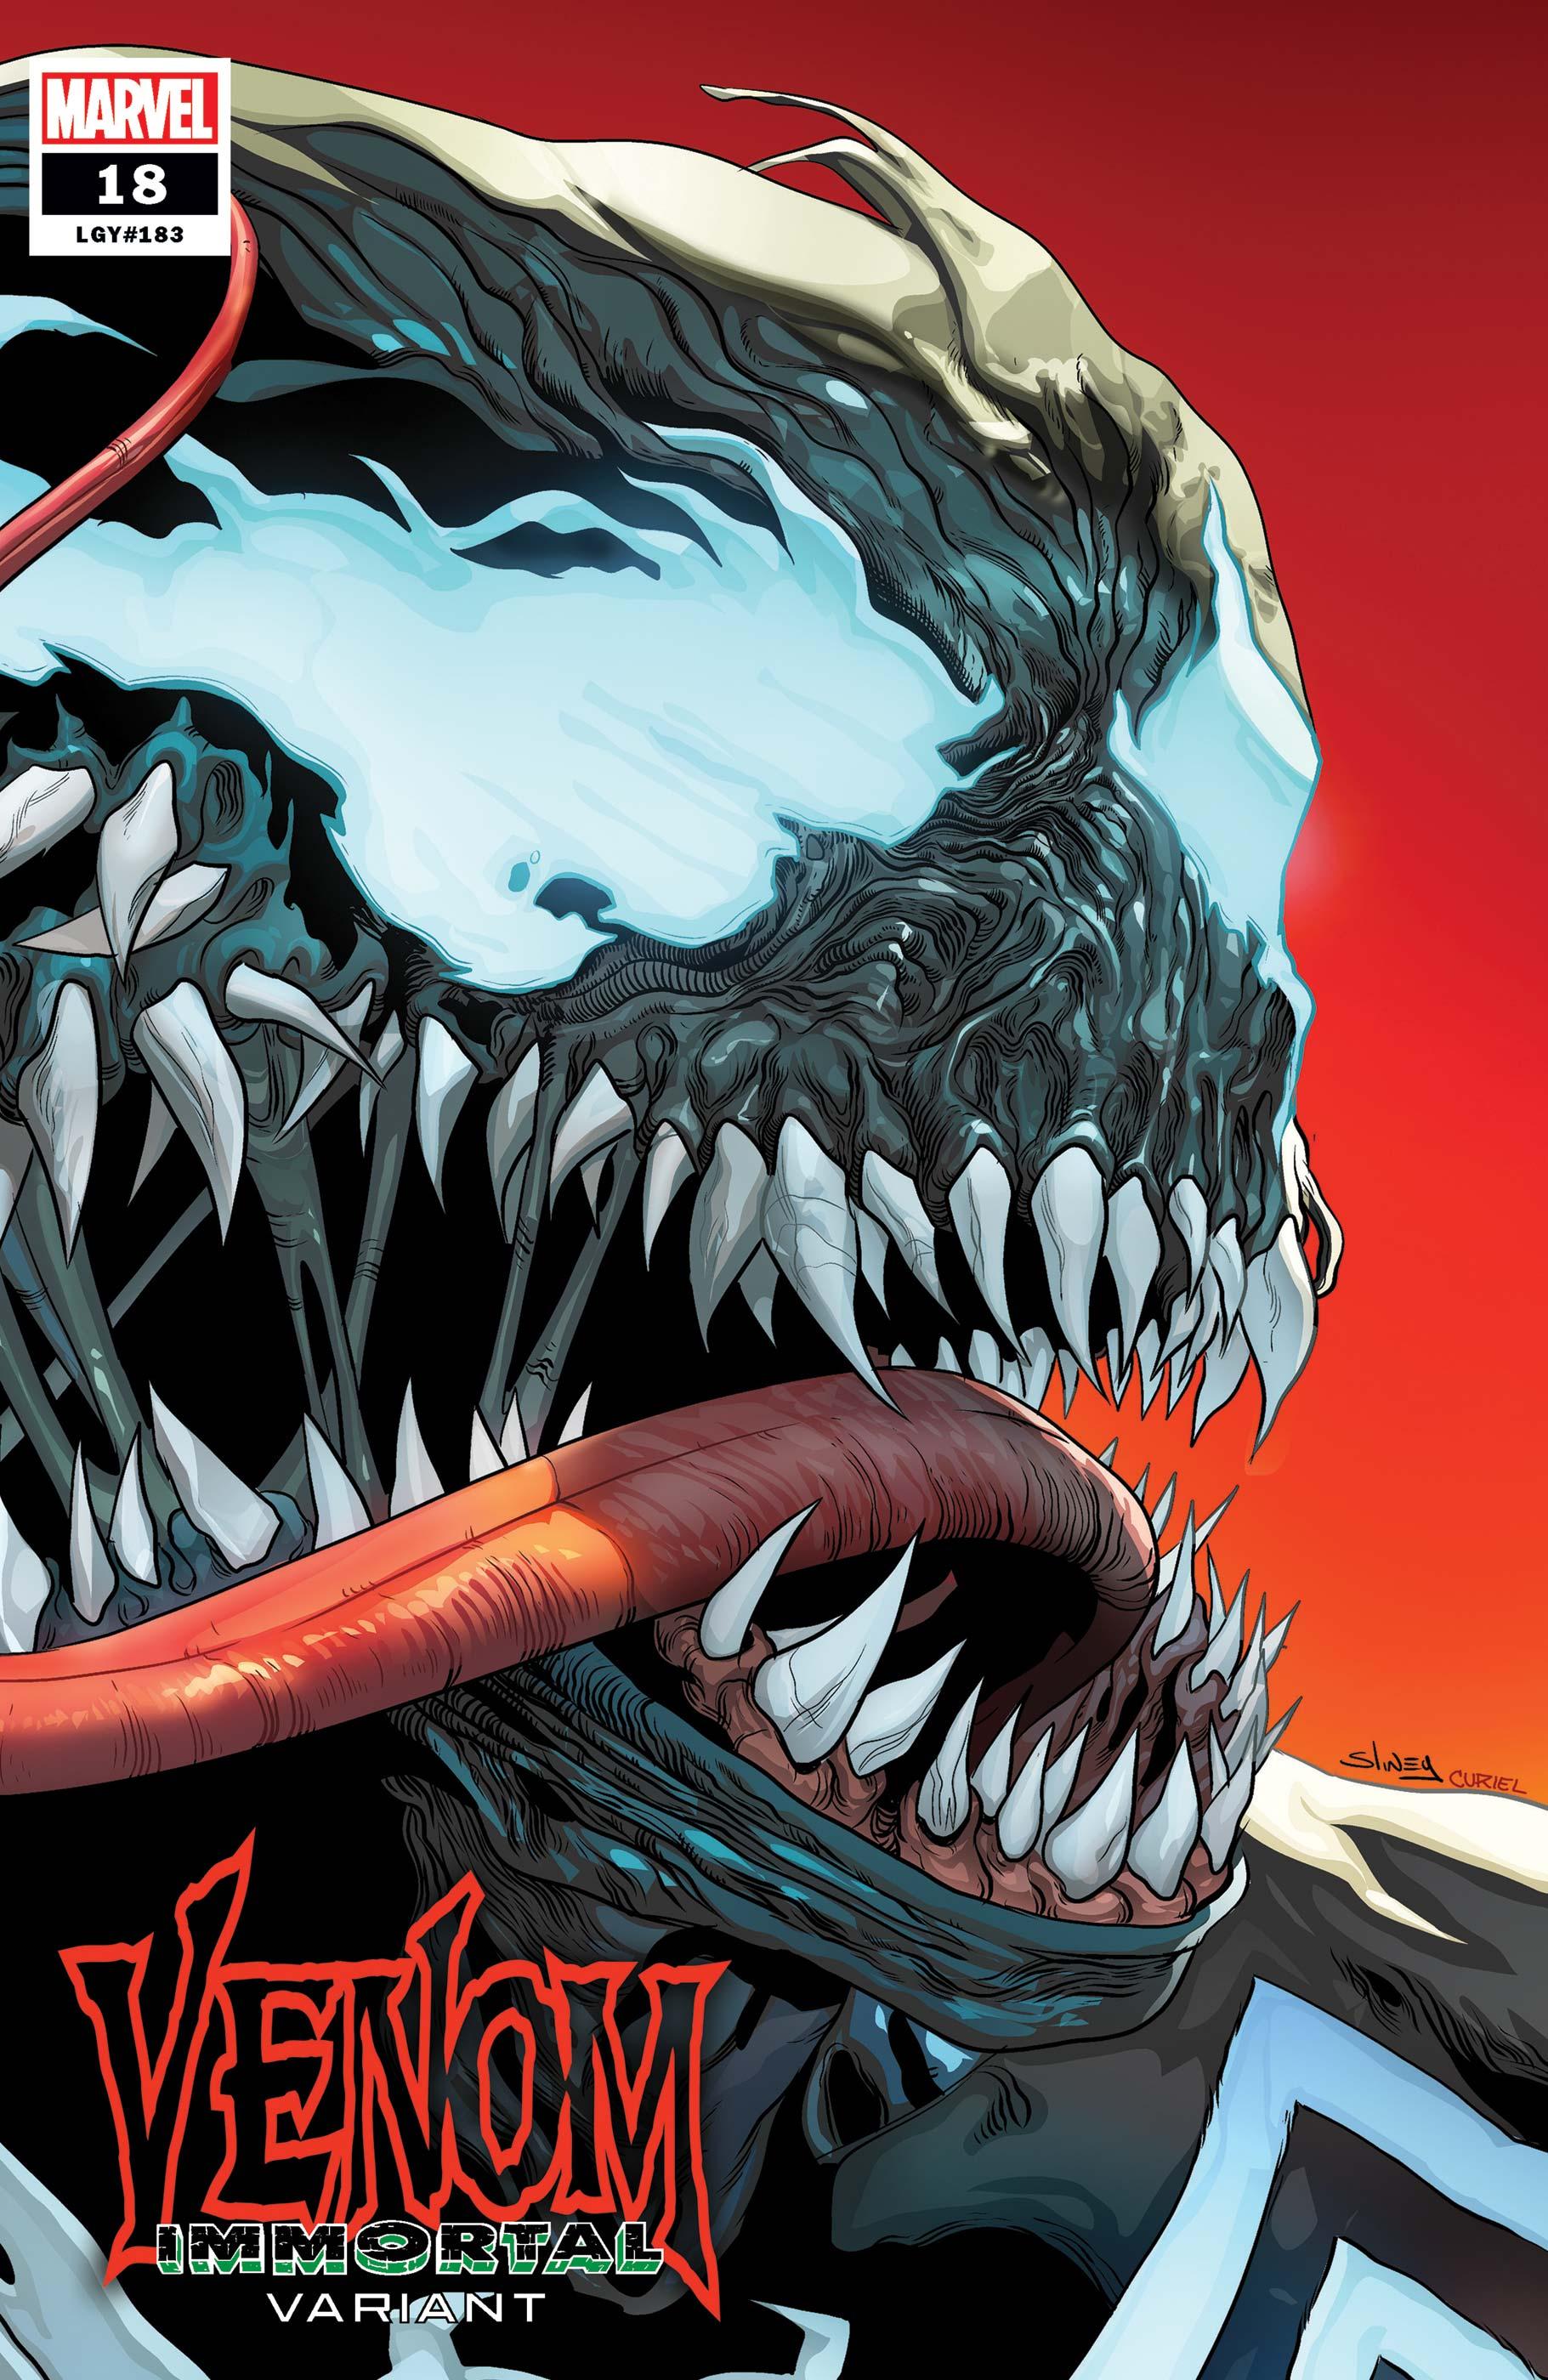 Venom (2018) #18 (Variant)